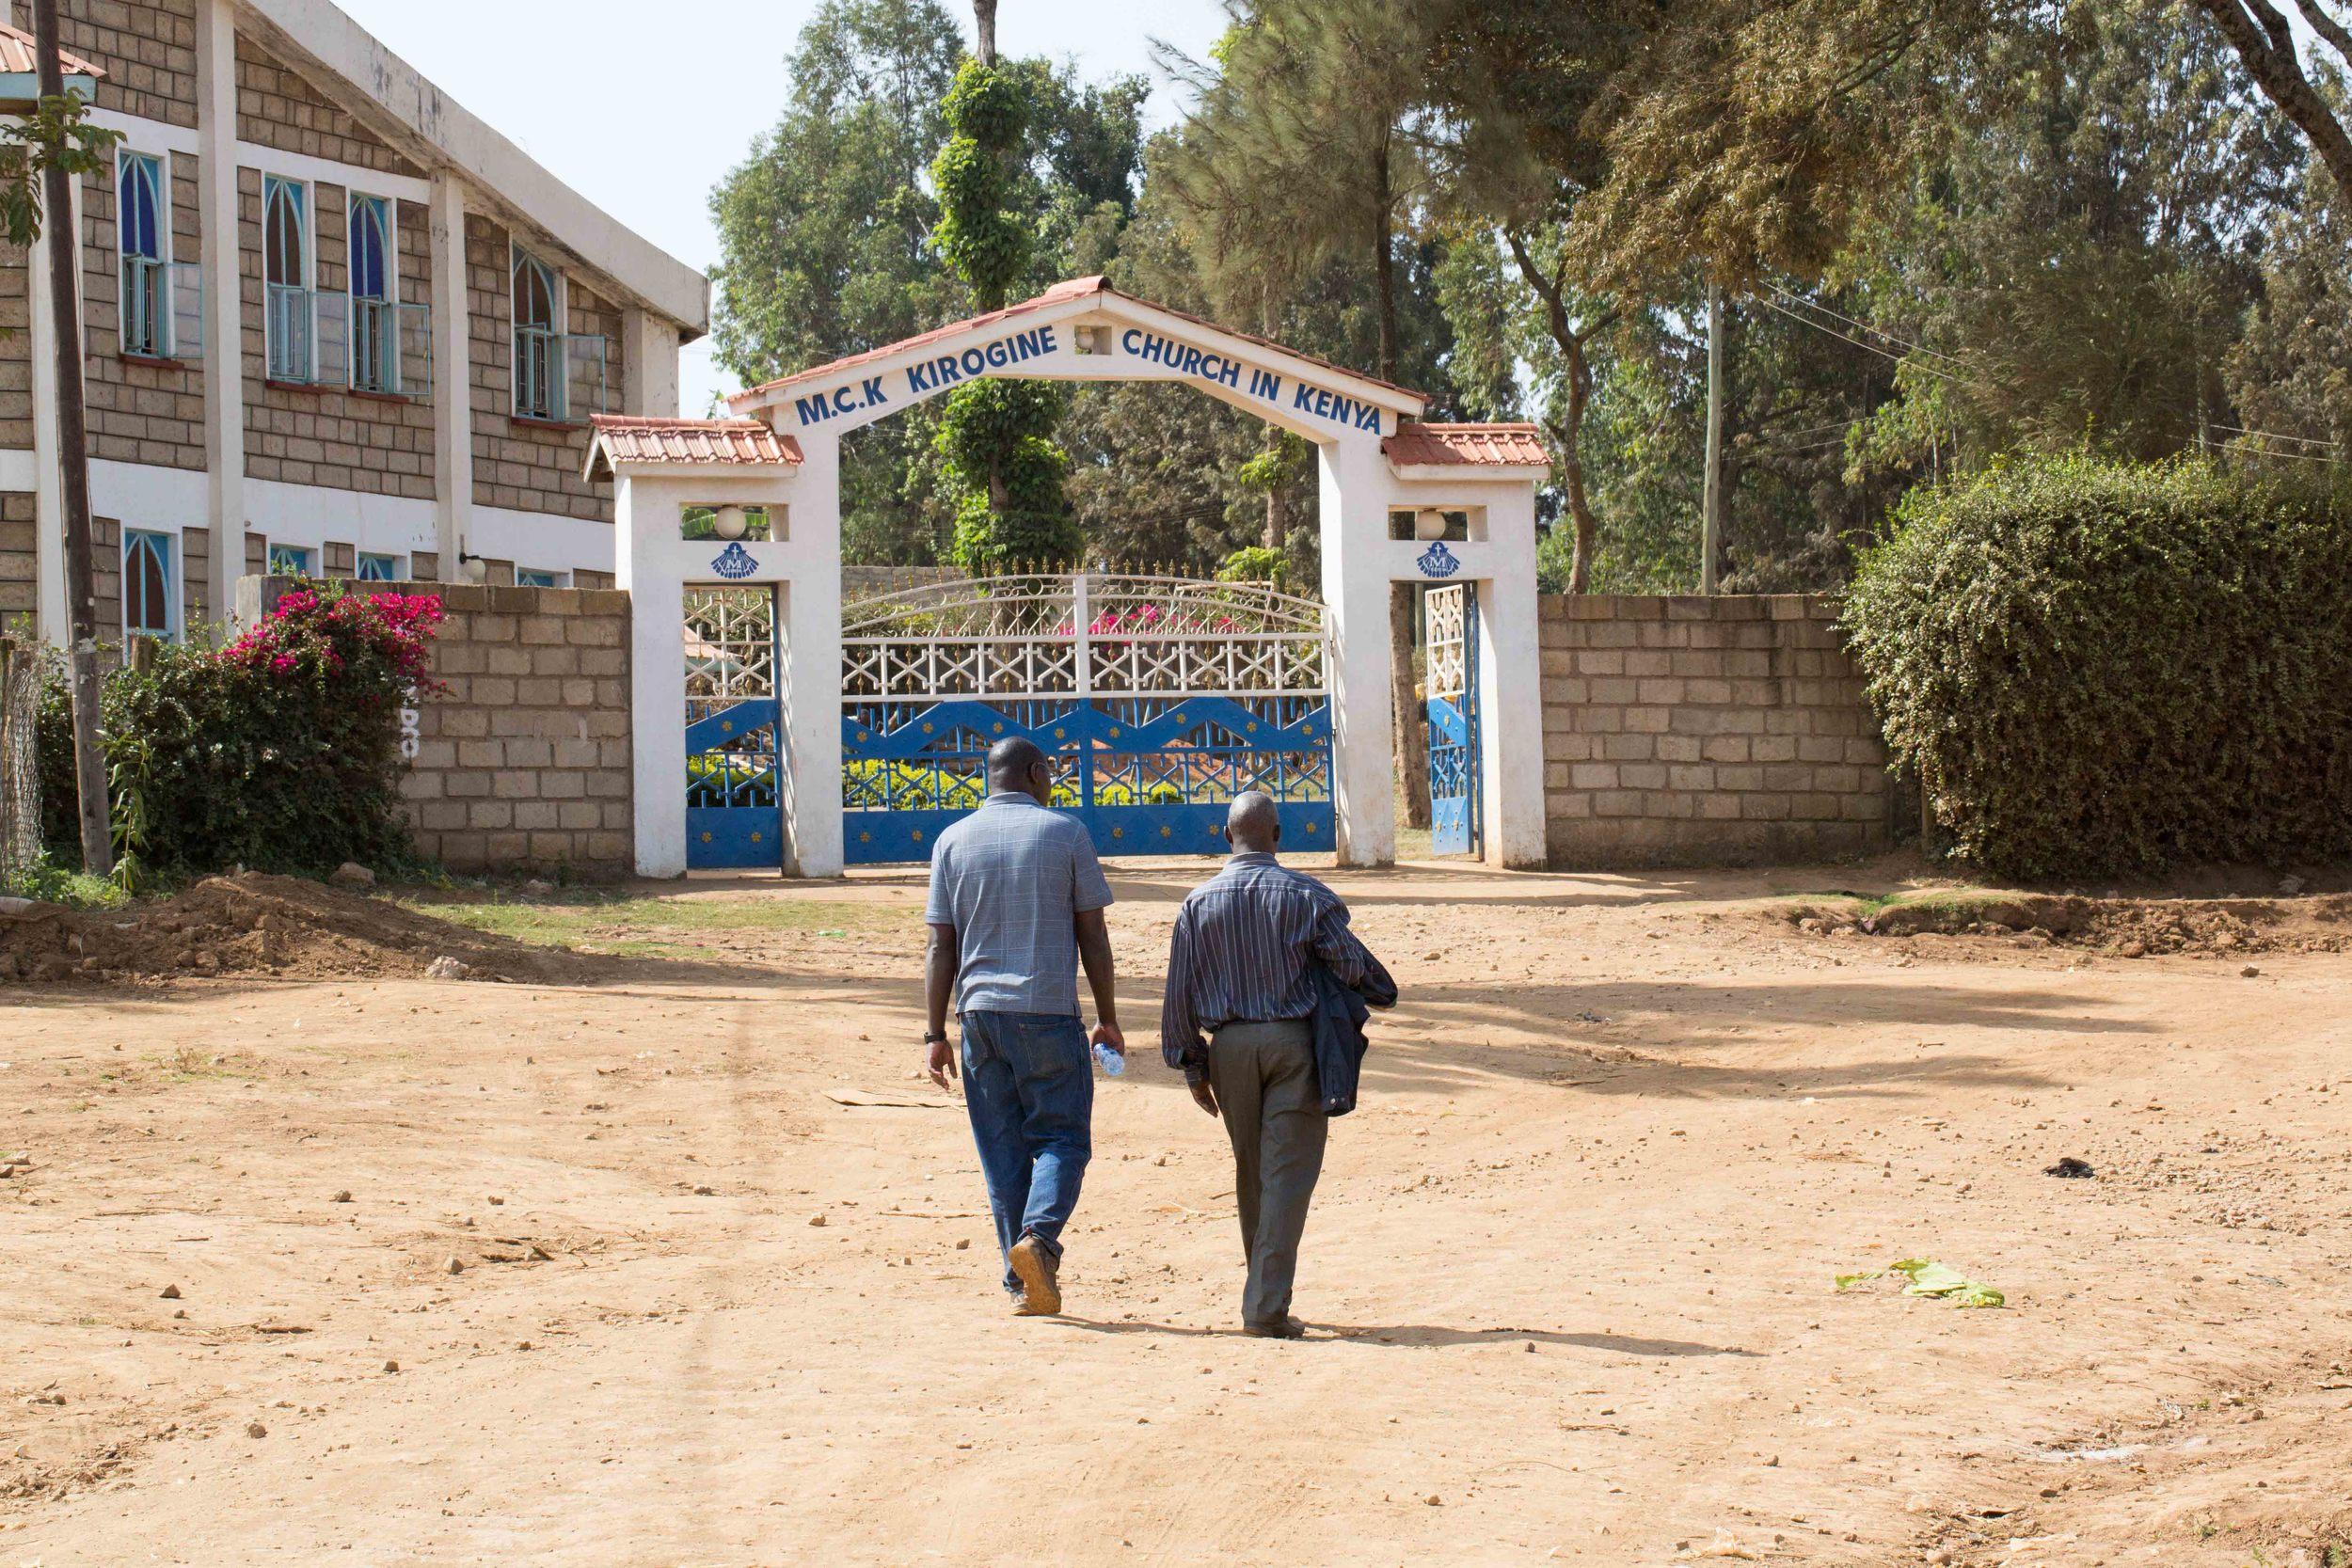 Methodist Church of Kenya - Kirogine, Meru